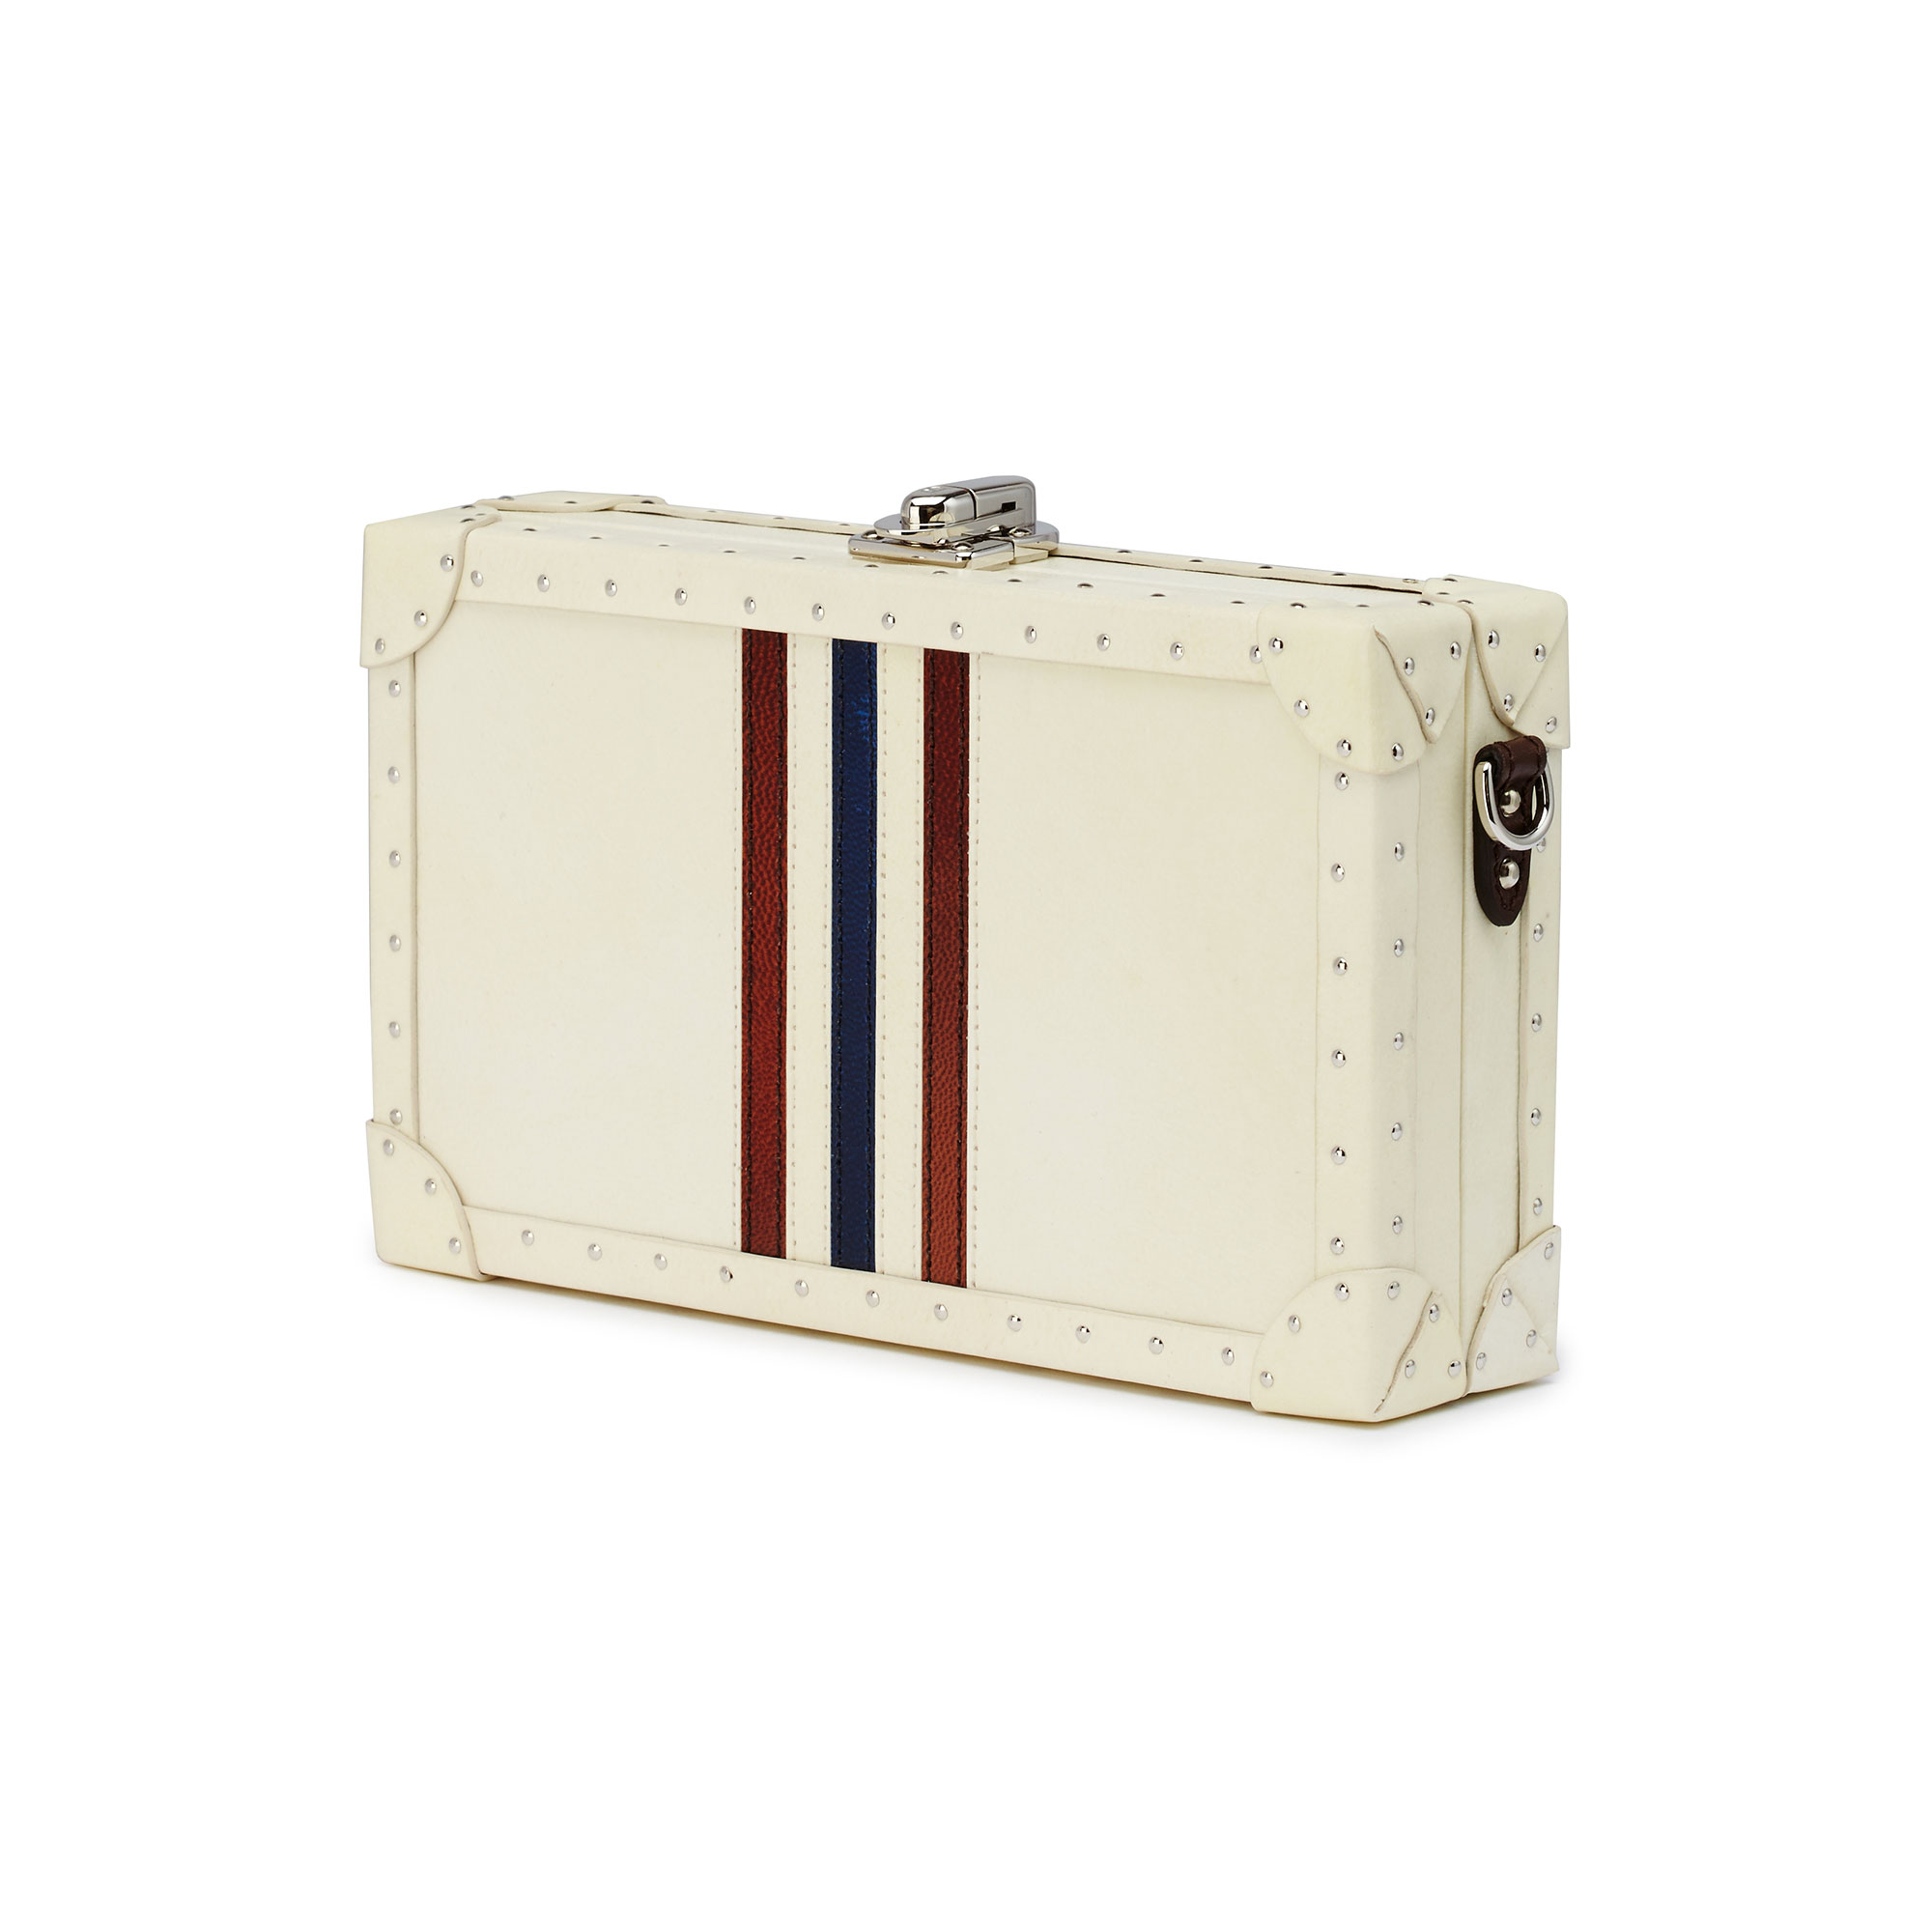 Box-Bertoncina-ivory-parchment-bag-Bertoni-1949_02